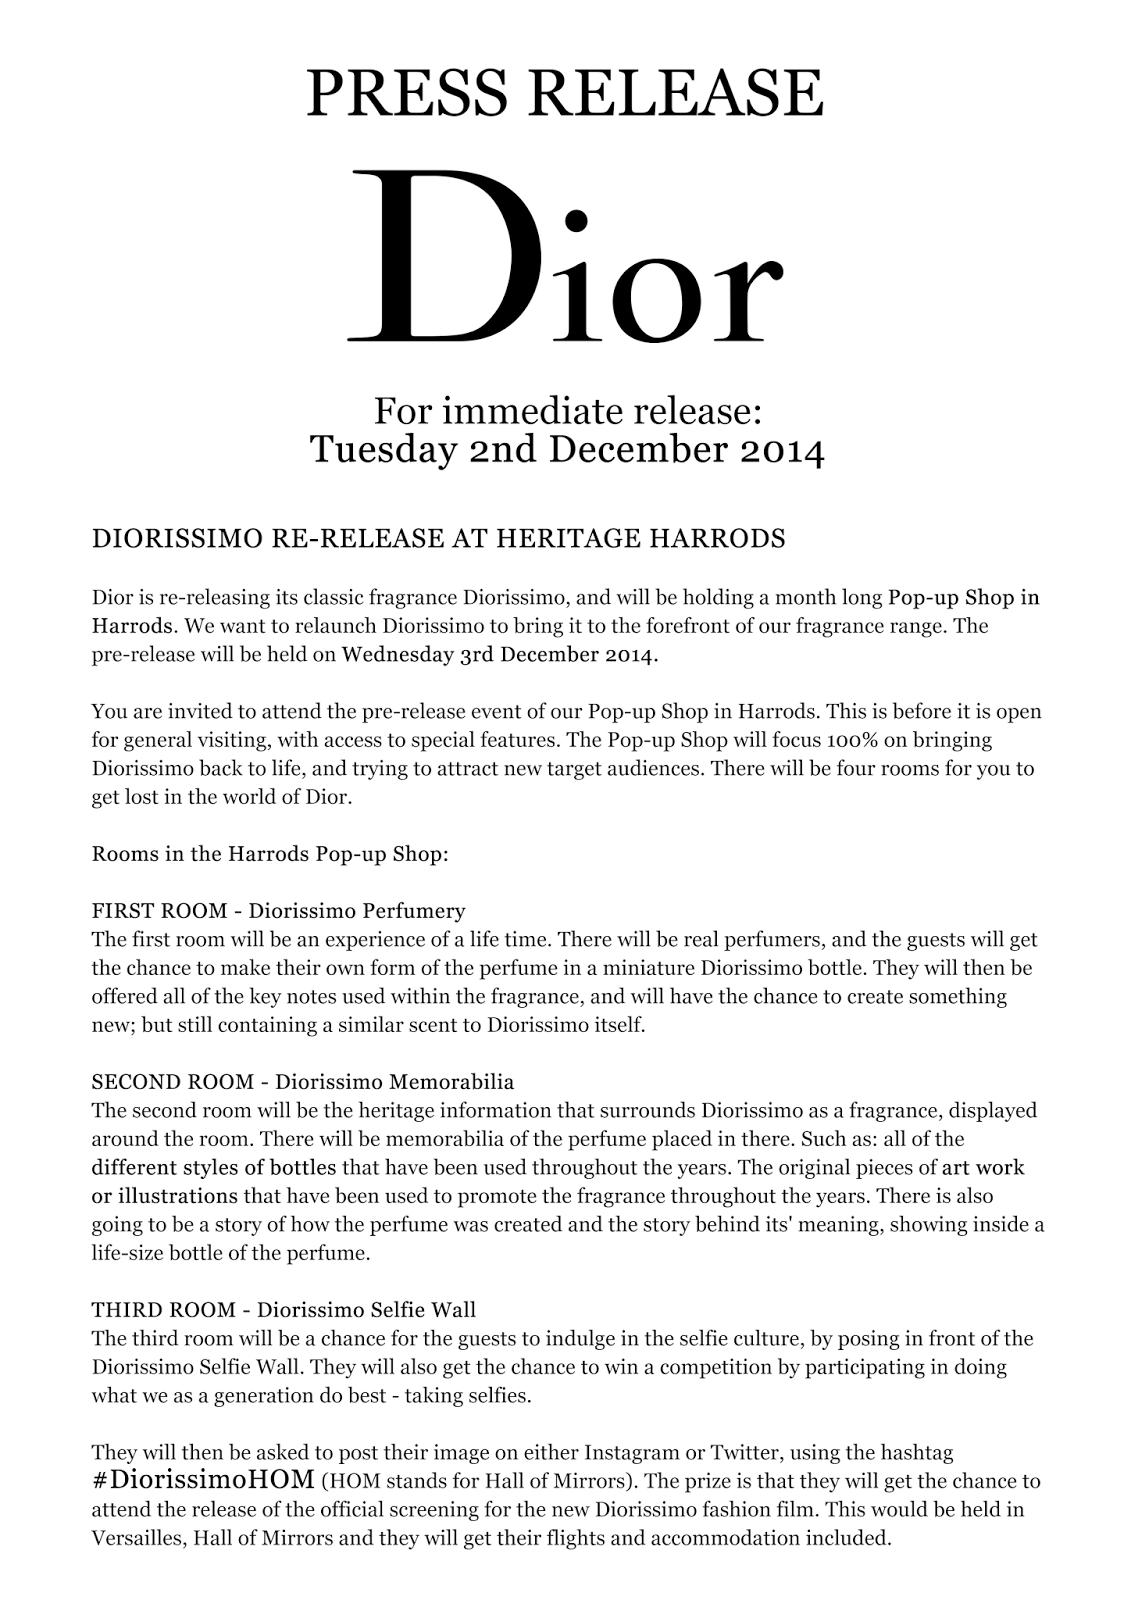 Fashion promotion blog press release diorissimo for Film press release template